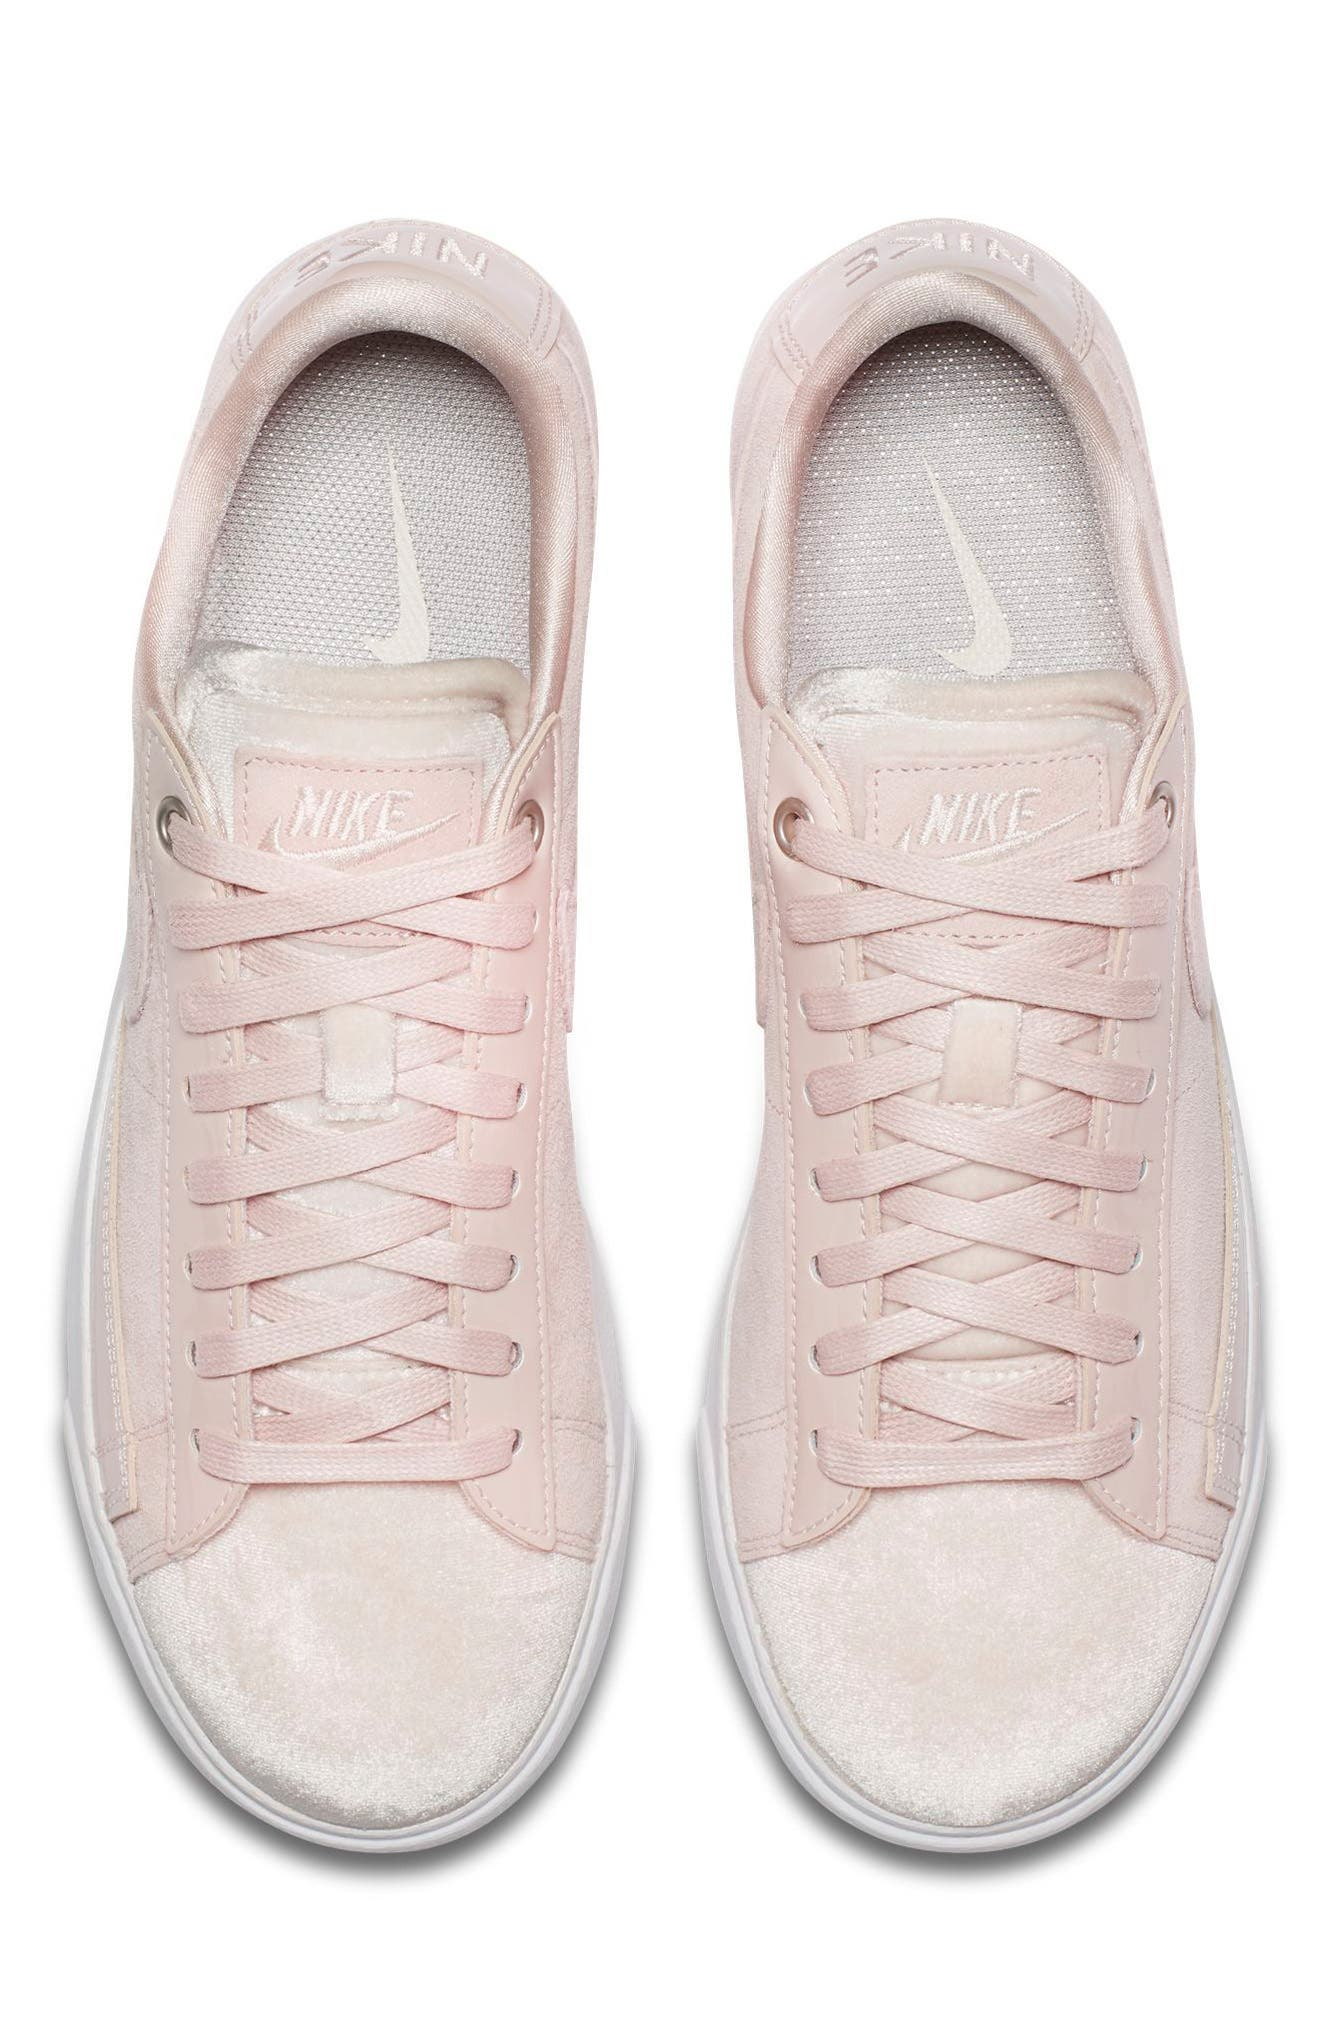 Blazer Low LX Sneaker,                             Alternate thumbnail 4, color,                             Silt Red/ Brown/ White